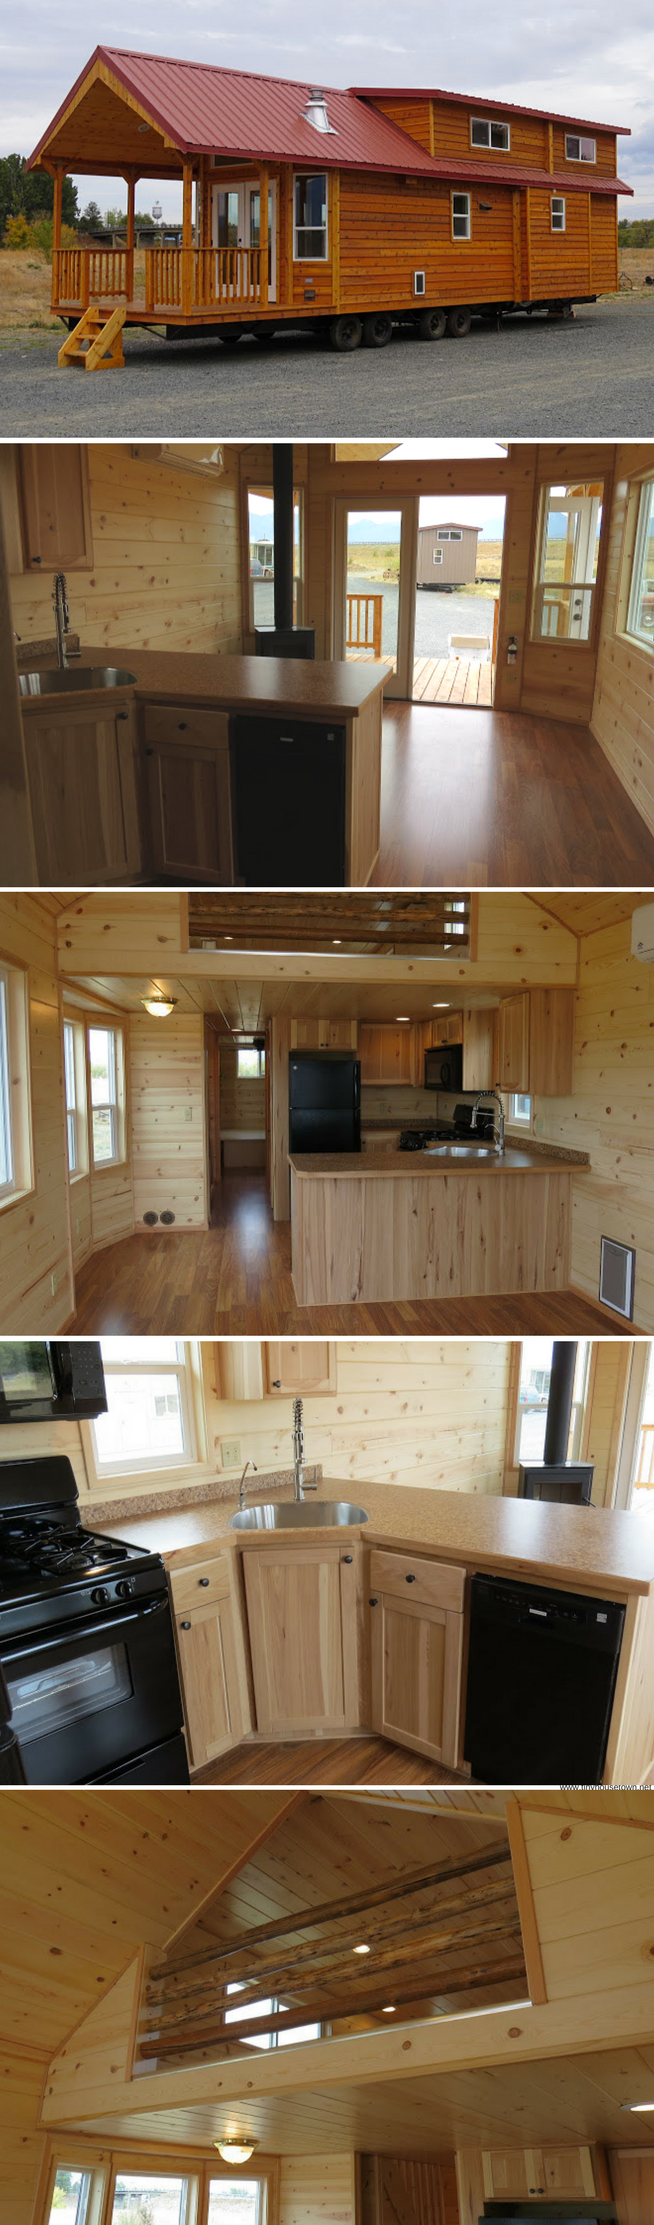 Classic Double Loft A Two Bedroom Park Model Cabin Tiny House Cabin Tiny House Plans Tiny House Living